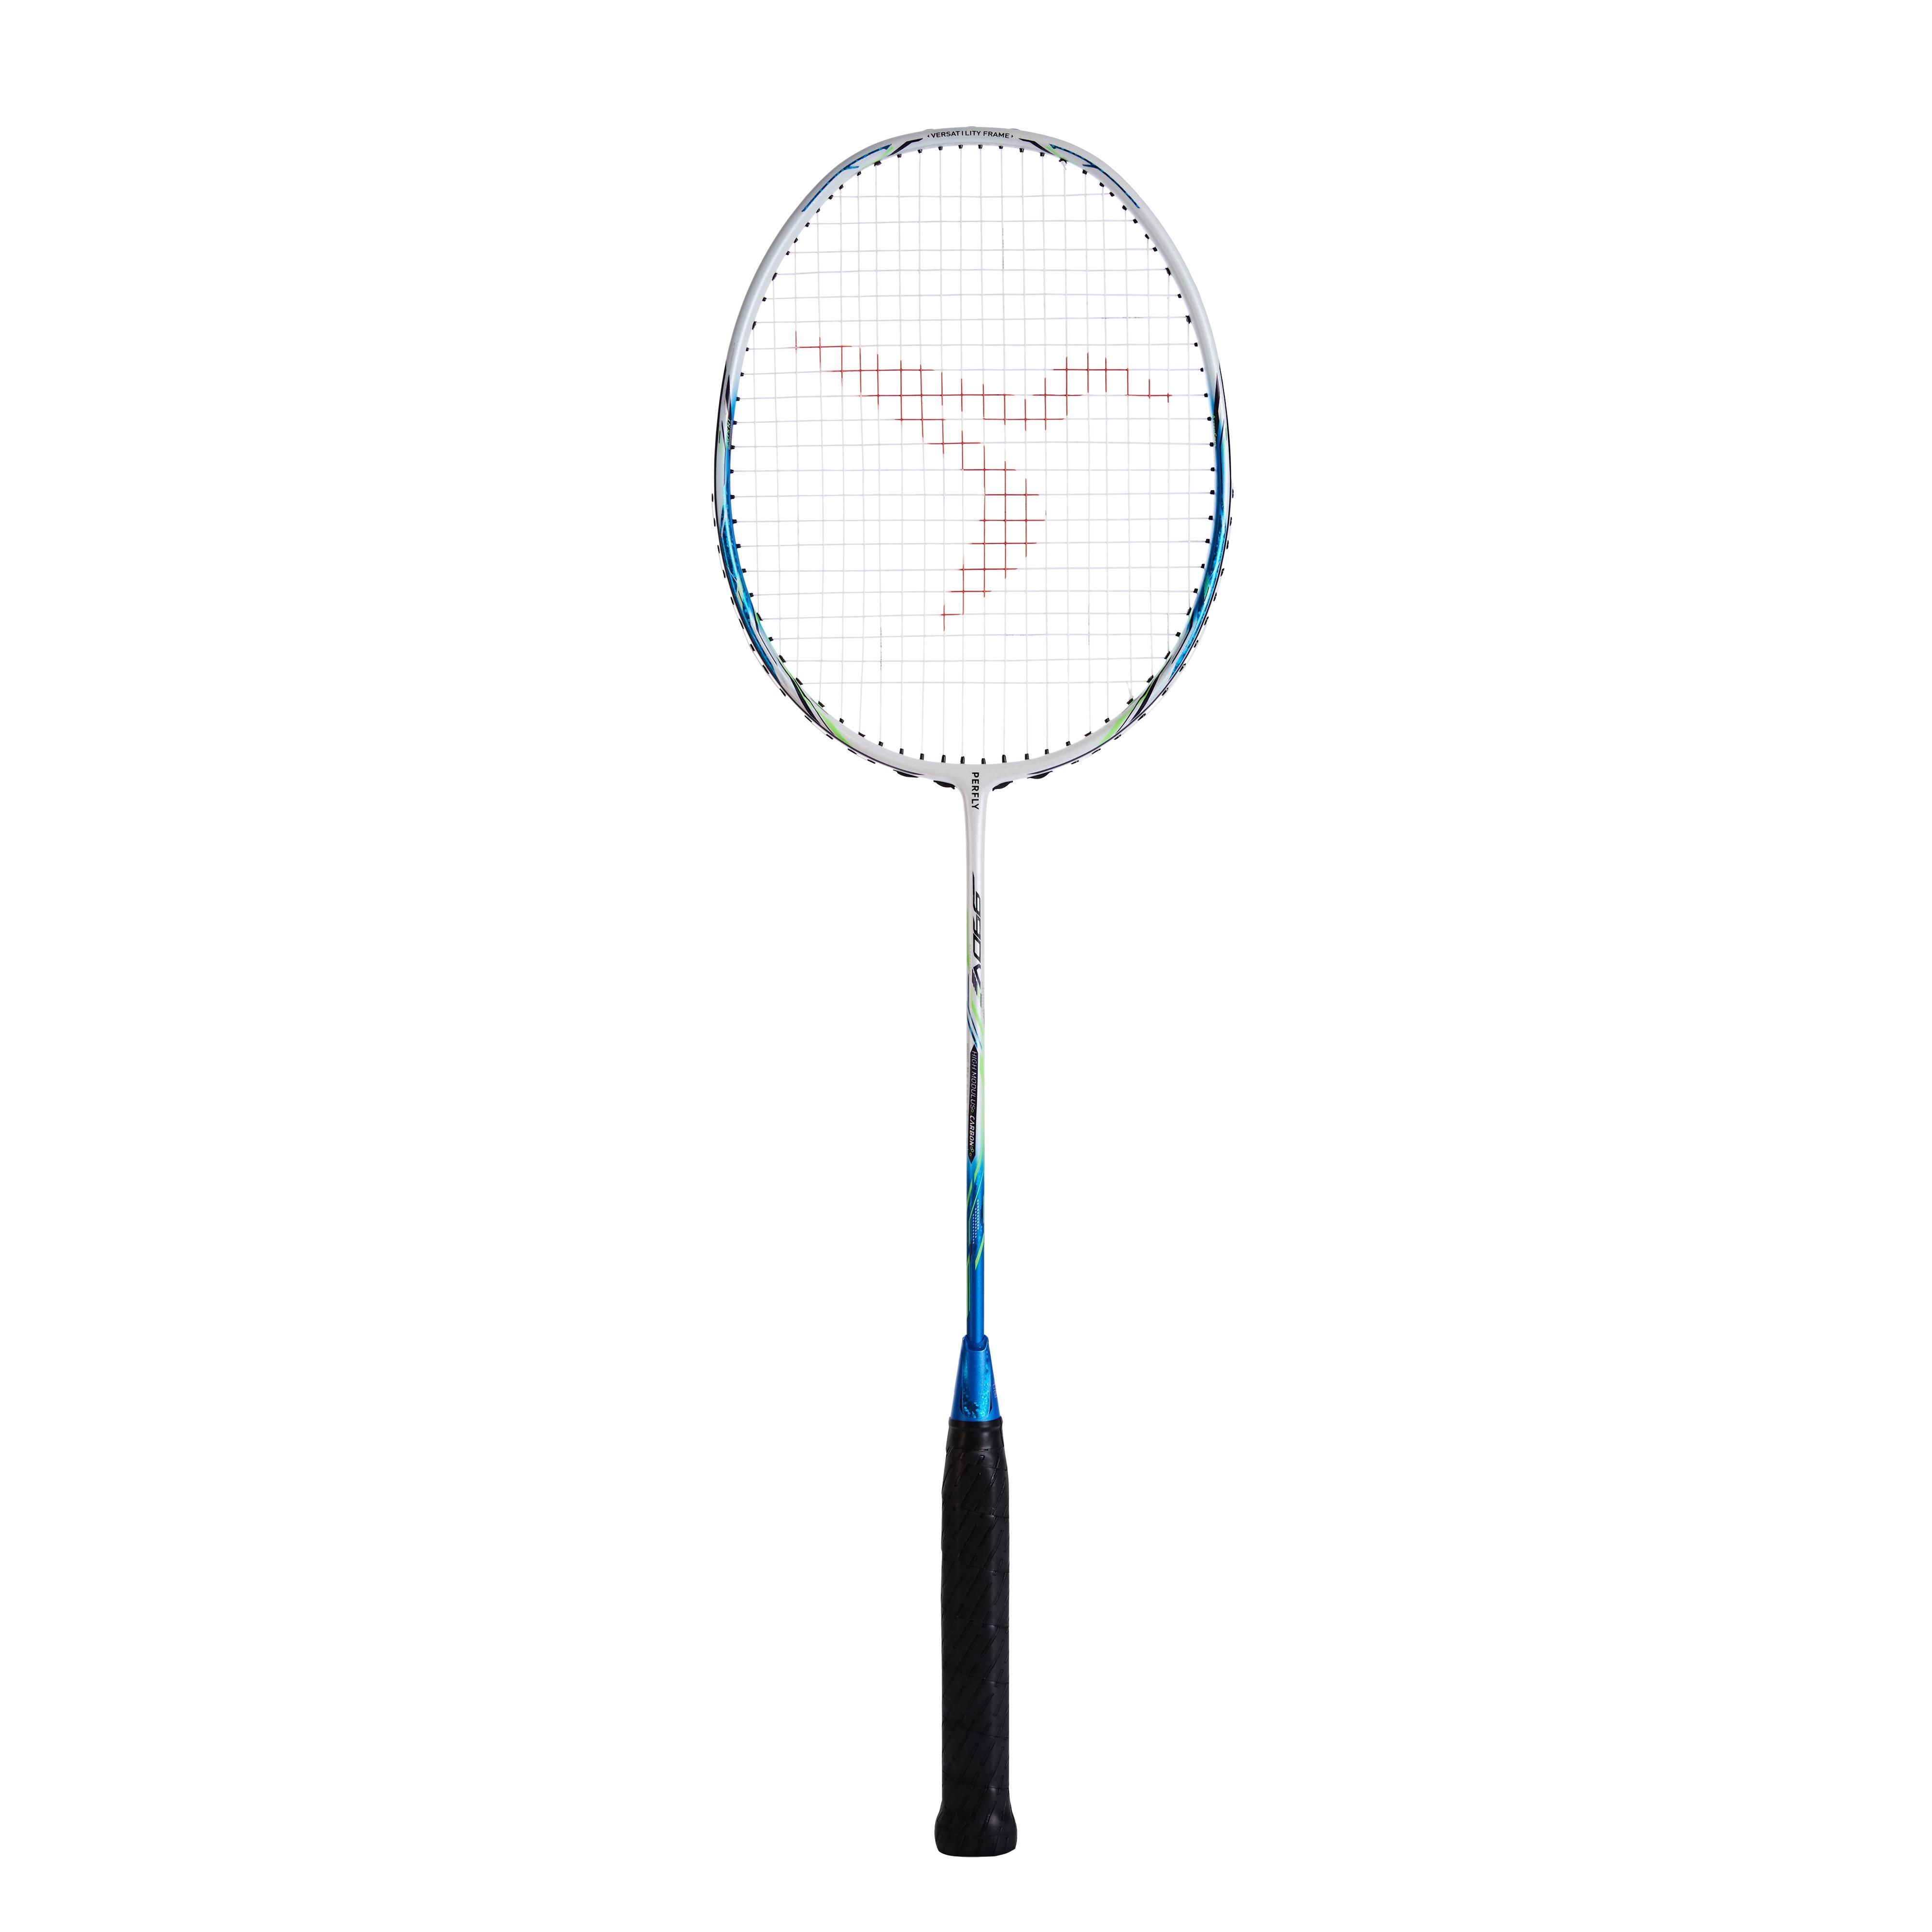 Rachetă Badminton BR 990 V imagine